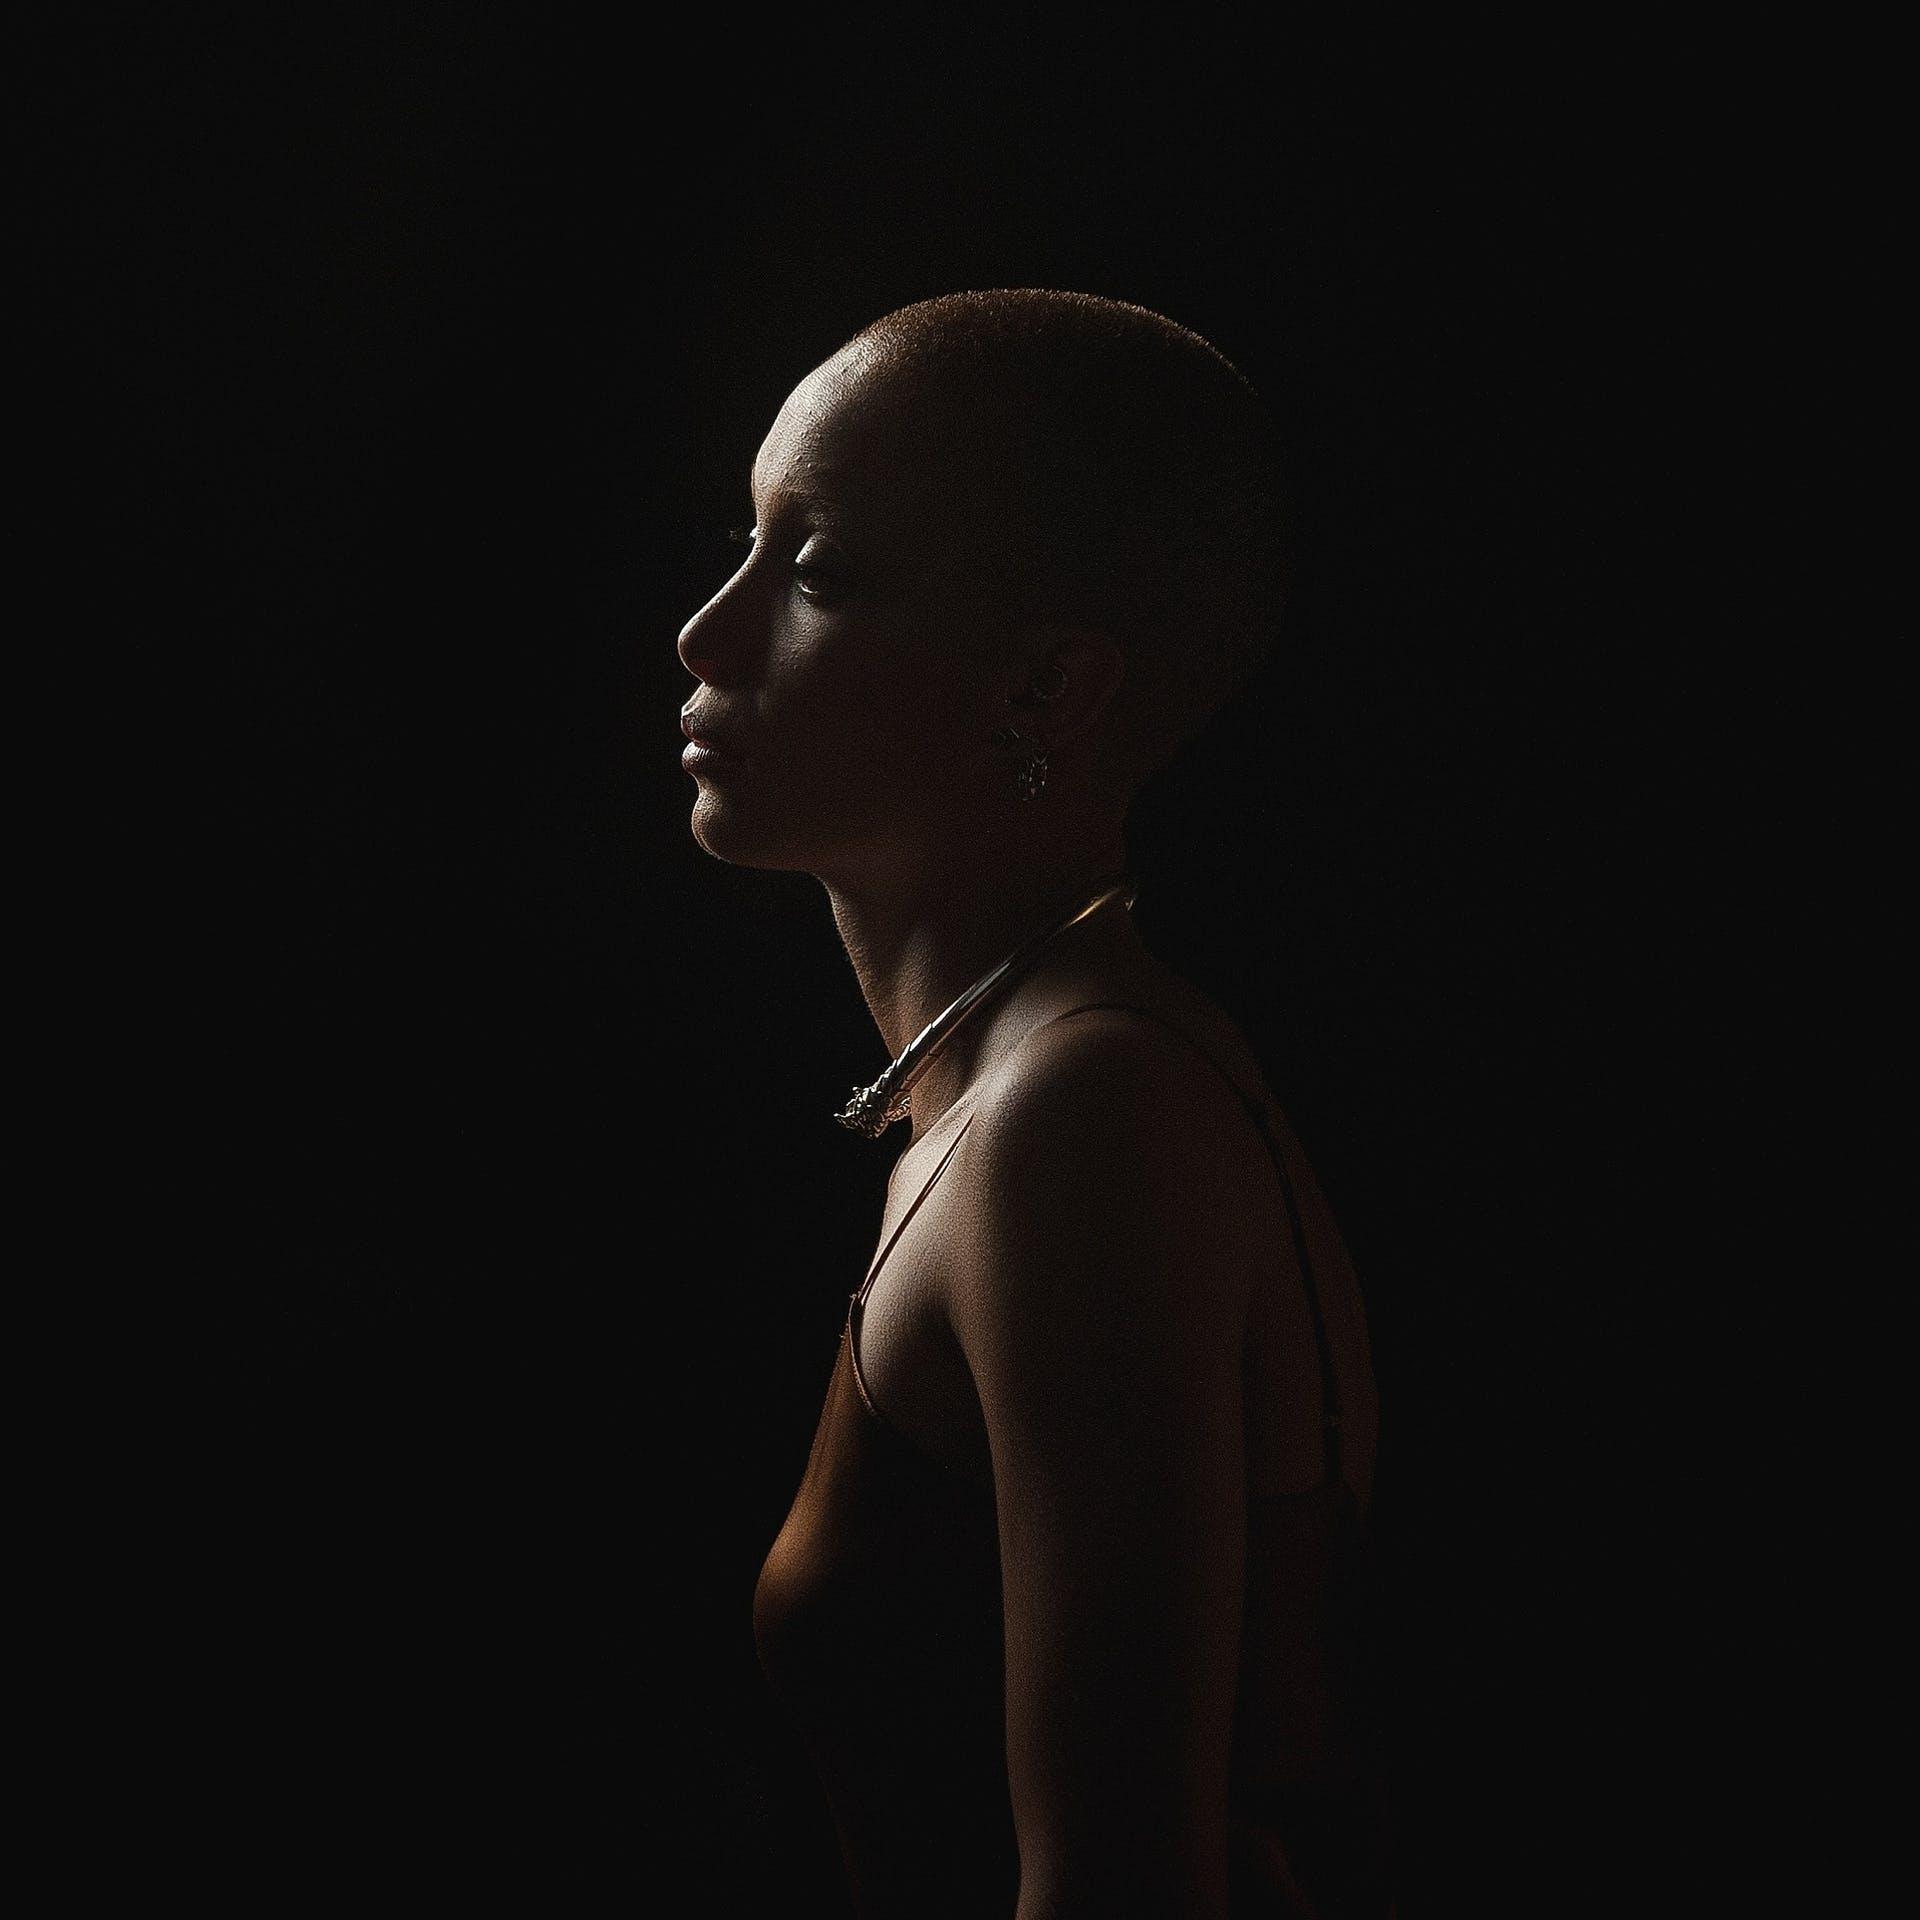 fashion lady bald photoshoot model sexy necklace shadow dark female